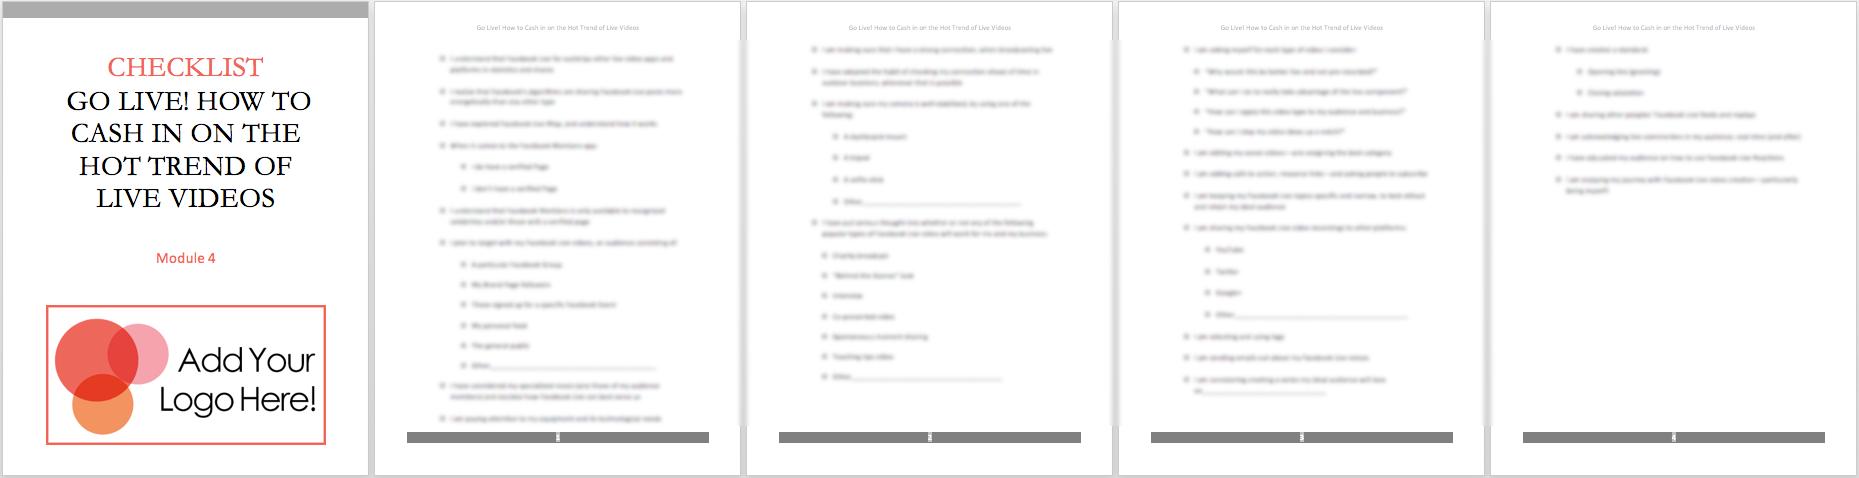 mod-4-checklist